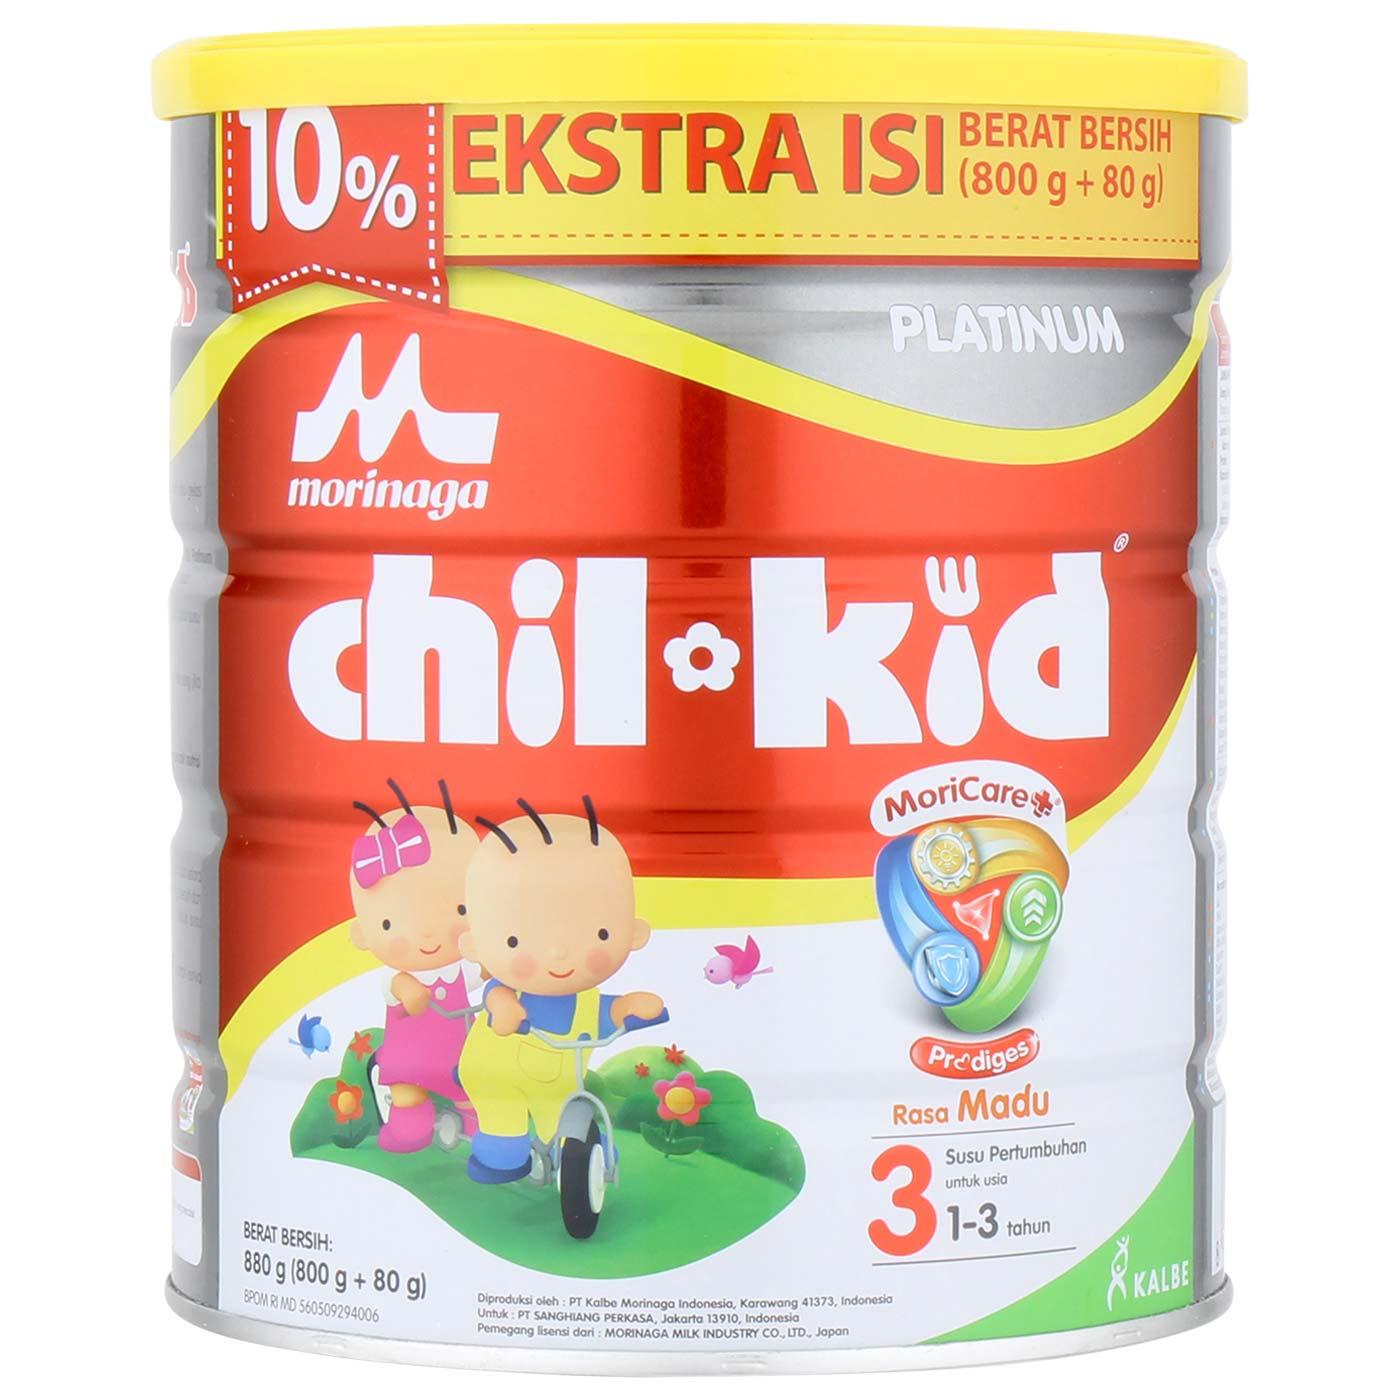 Morinaga Chil Kid Platinum Moricare+ Madu 800gr 1